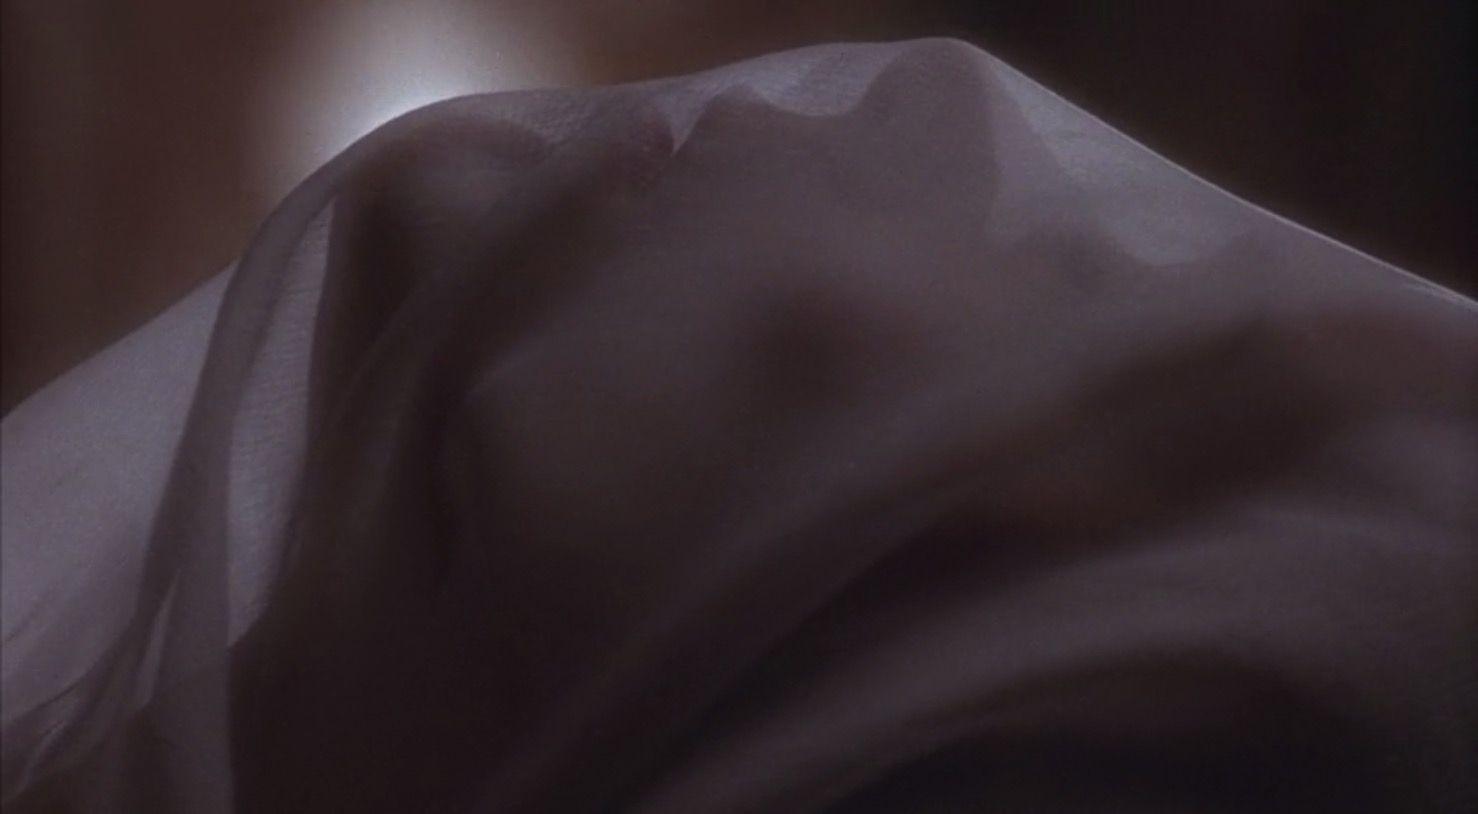 lady chatterleys lover, masturbation, sex scene, sexy netflix films,